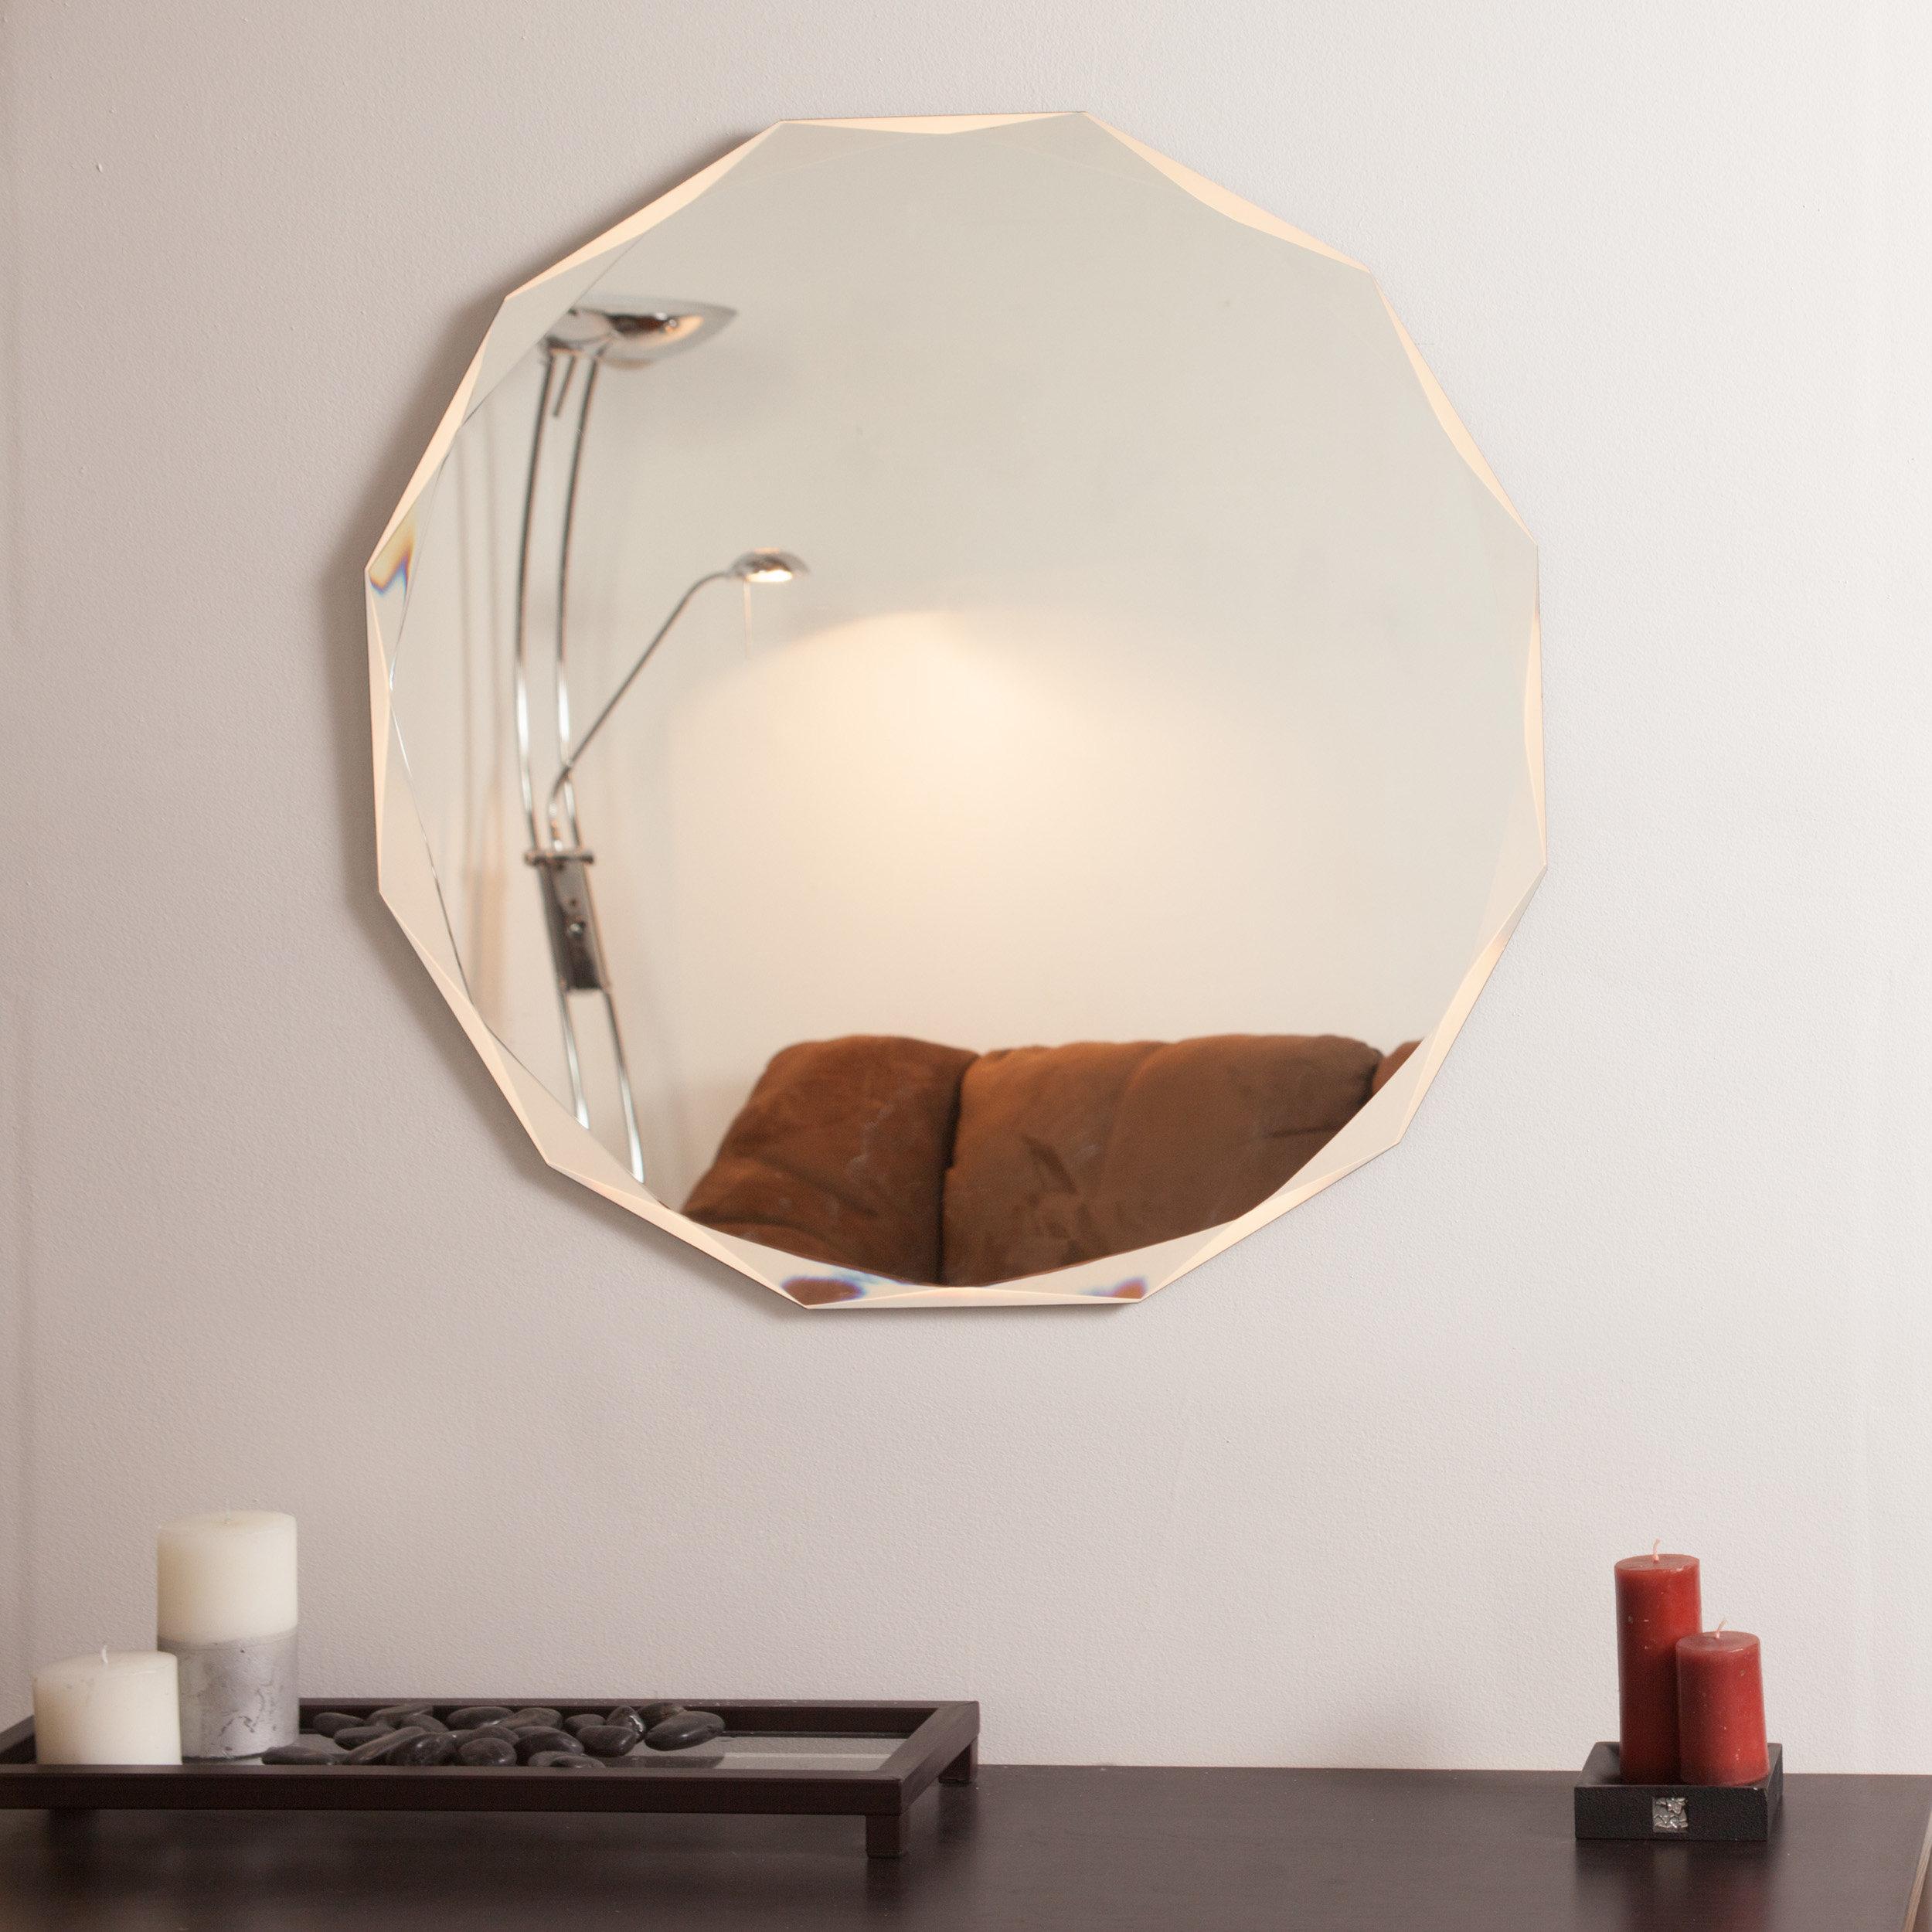 Decor Wonderland Frameless Diamond Wall Mirror & Reviews Pertaining To Traditional Frameless Diamond Wall Mirrors (View 10 of 20)